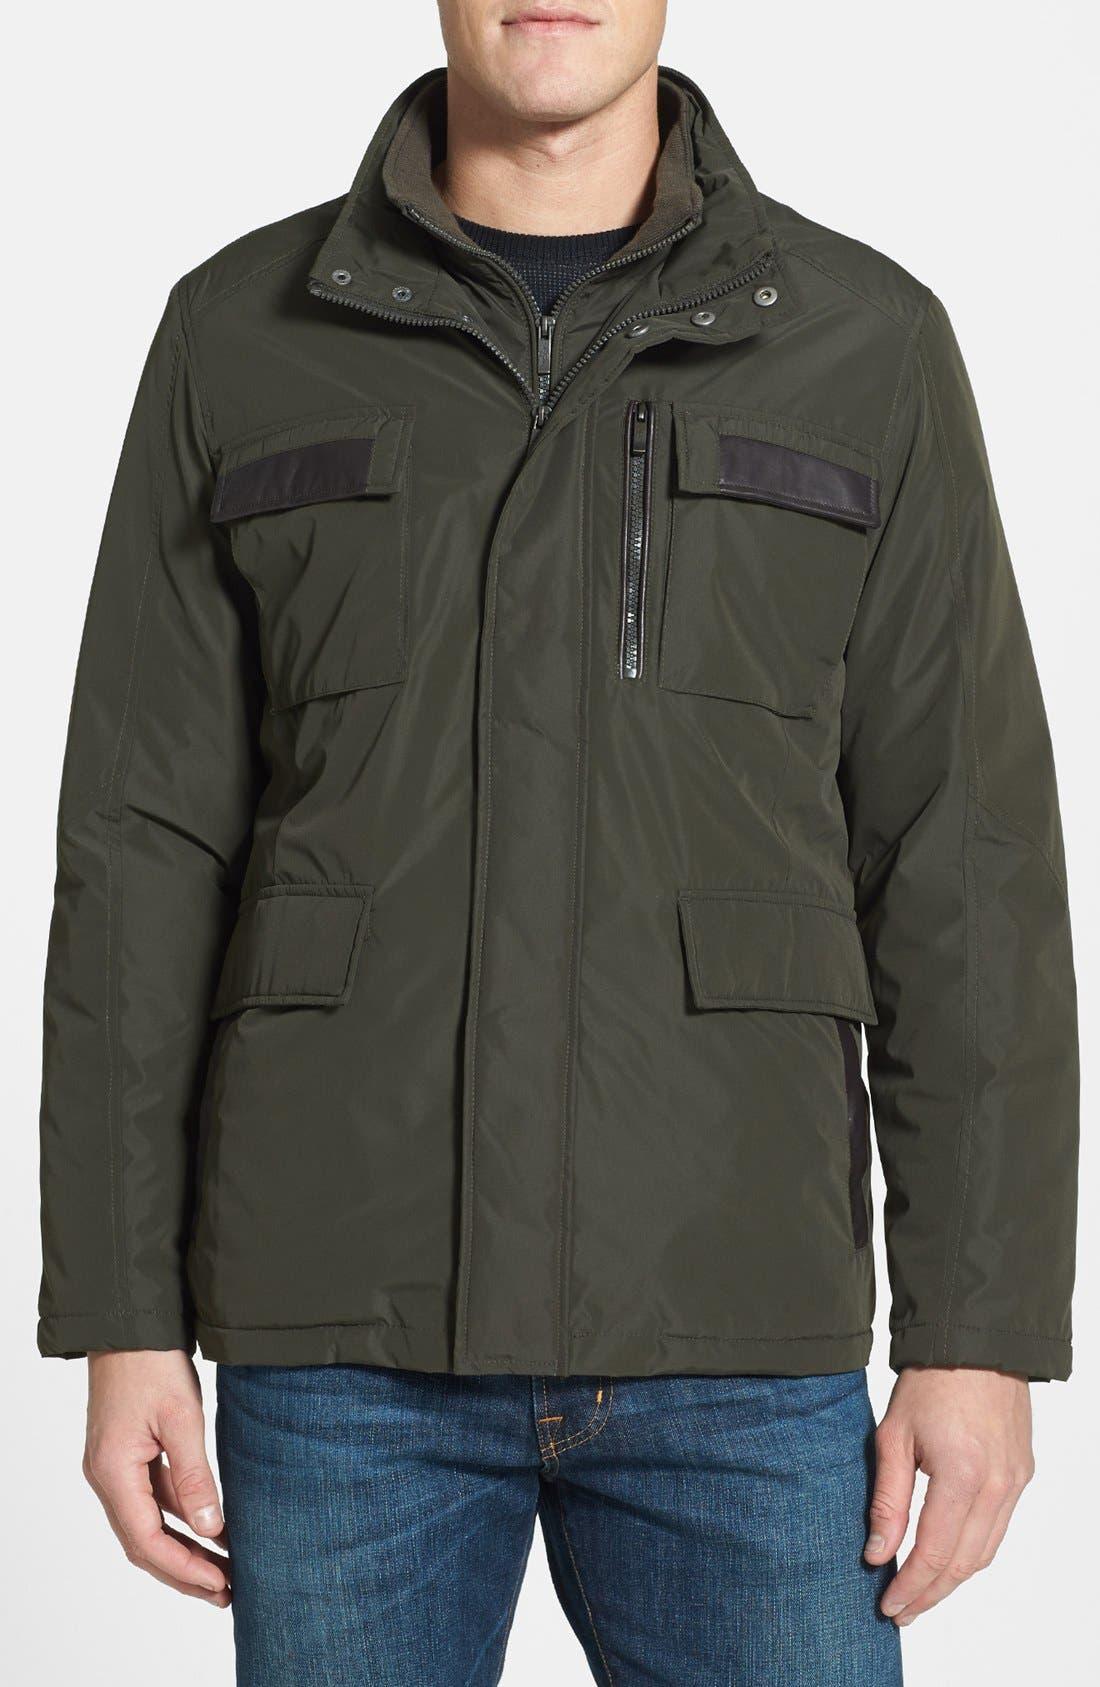 Alternate Image 1 Selected - Cole Haan Nylon Jacket